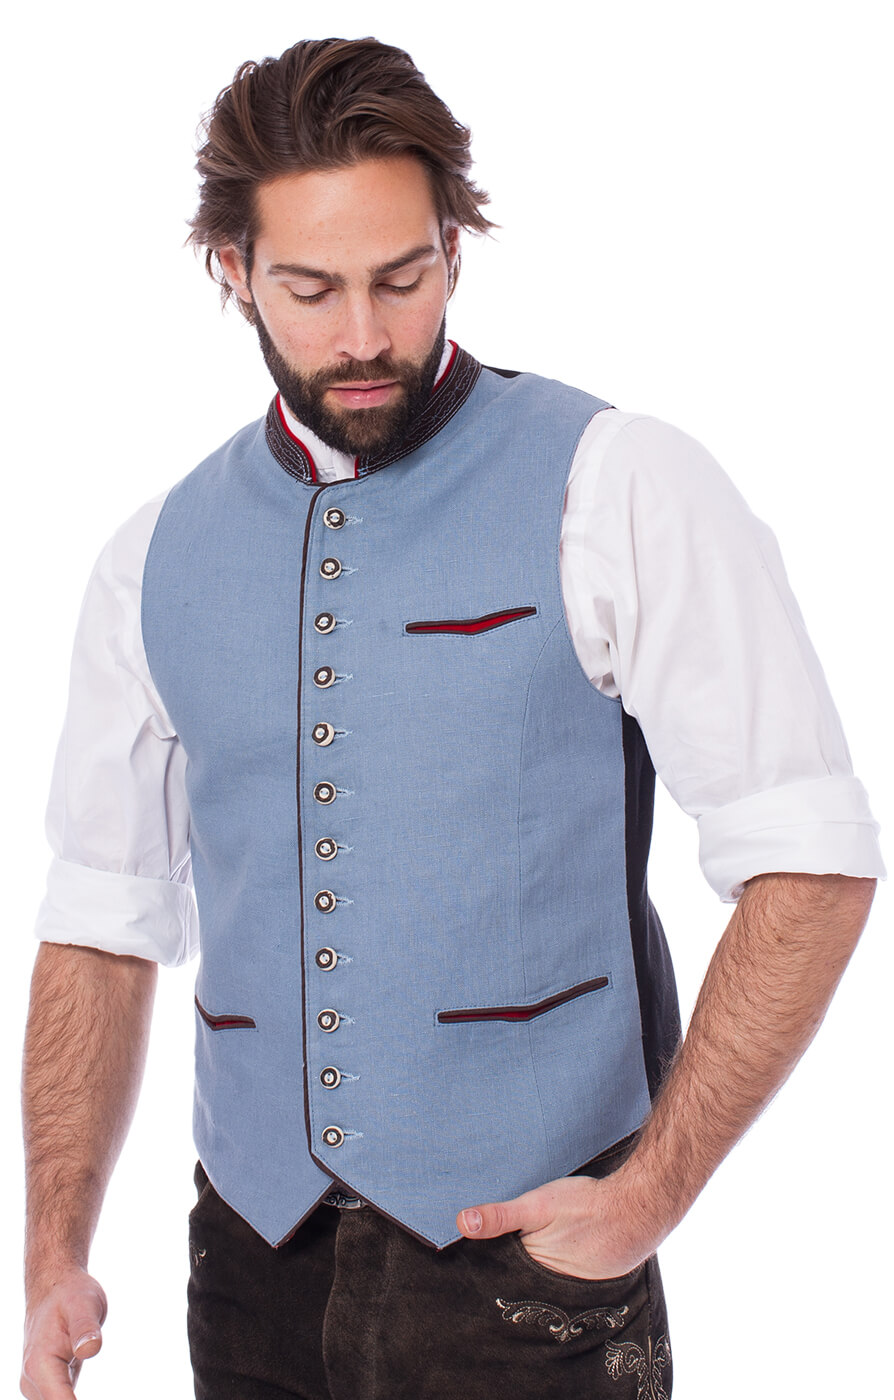 Traditional waistcoat CAMILLO-HK-icebrown von Almsach